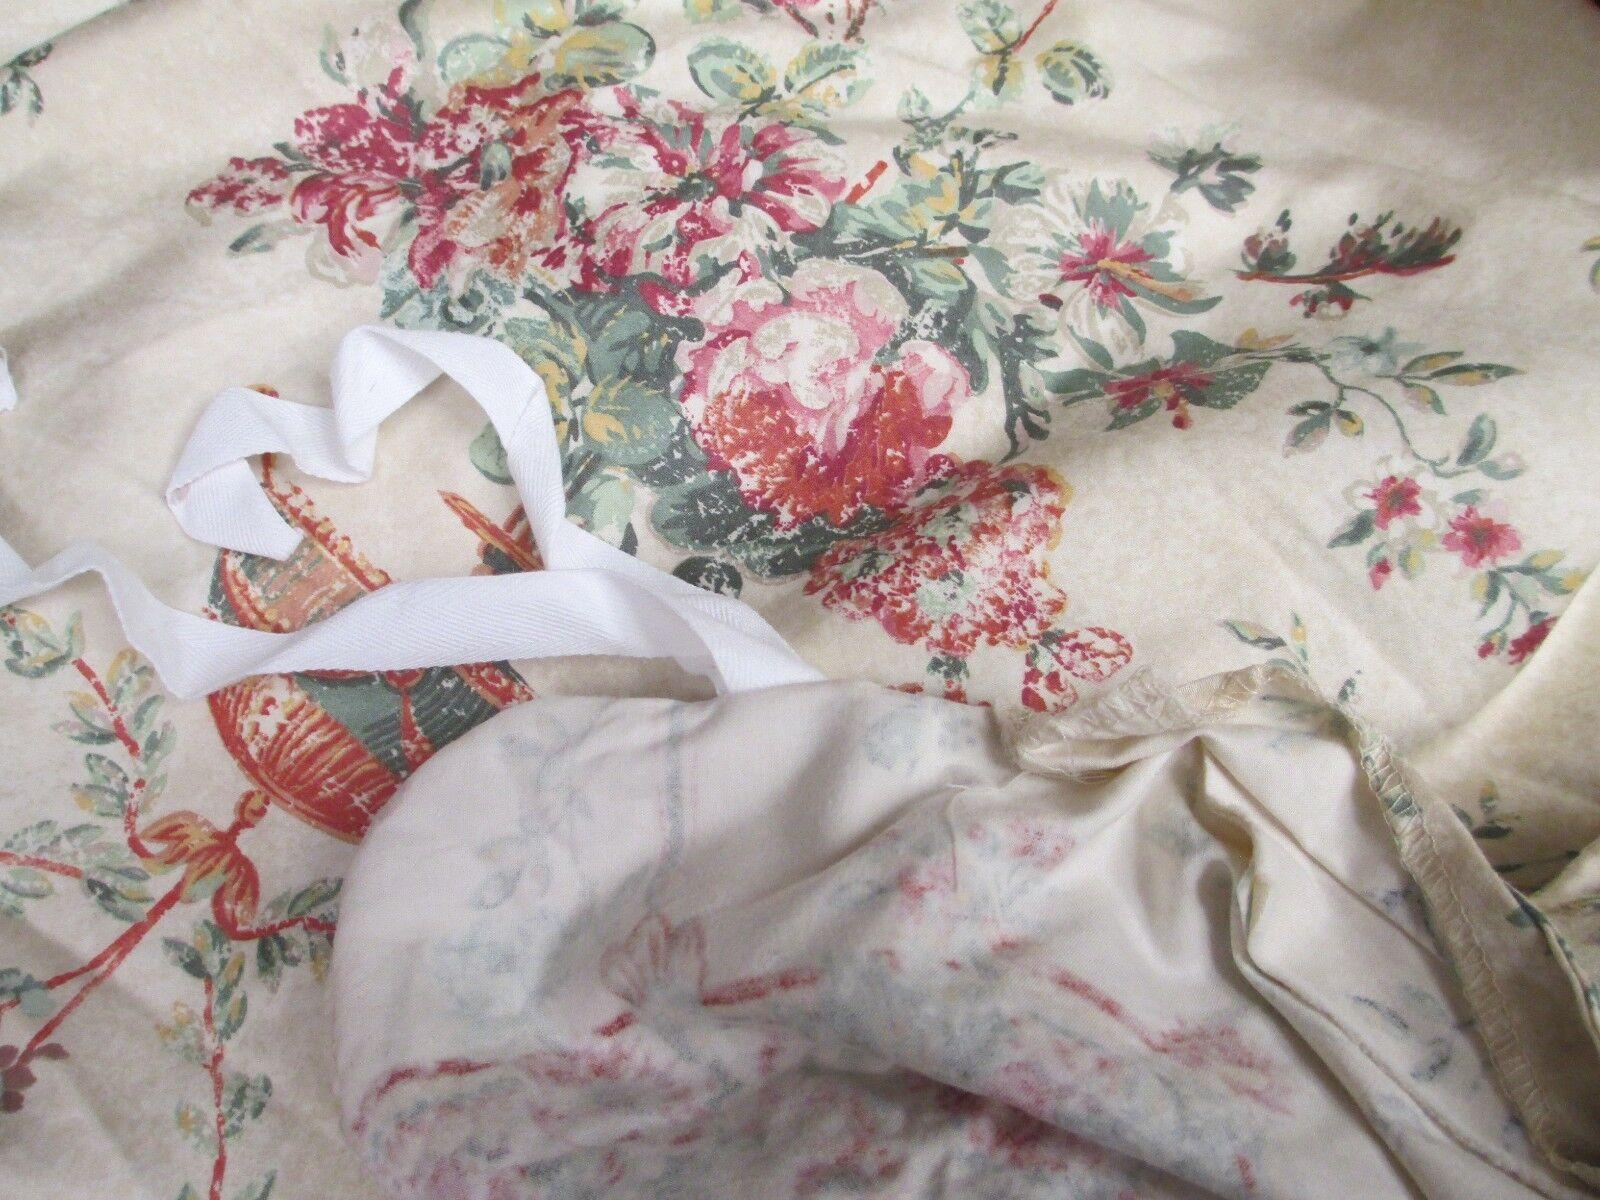 Ralph Lauren VILLANDRY Floral Duvet Comforter Cover - King